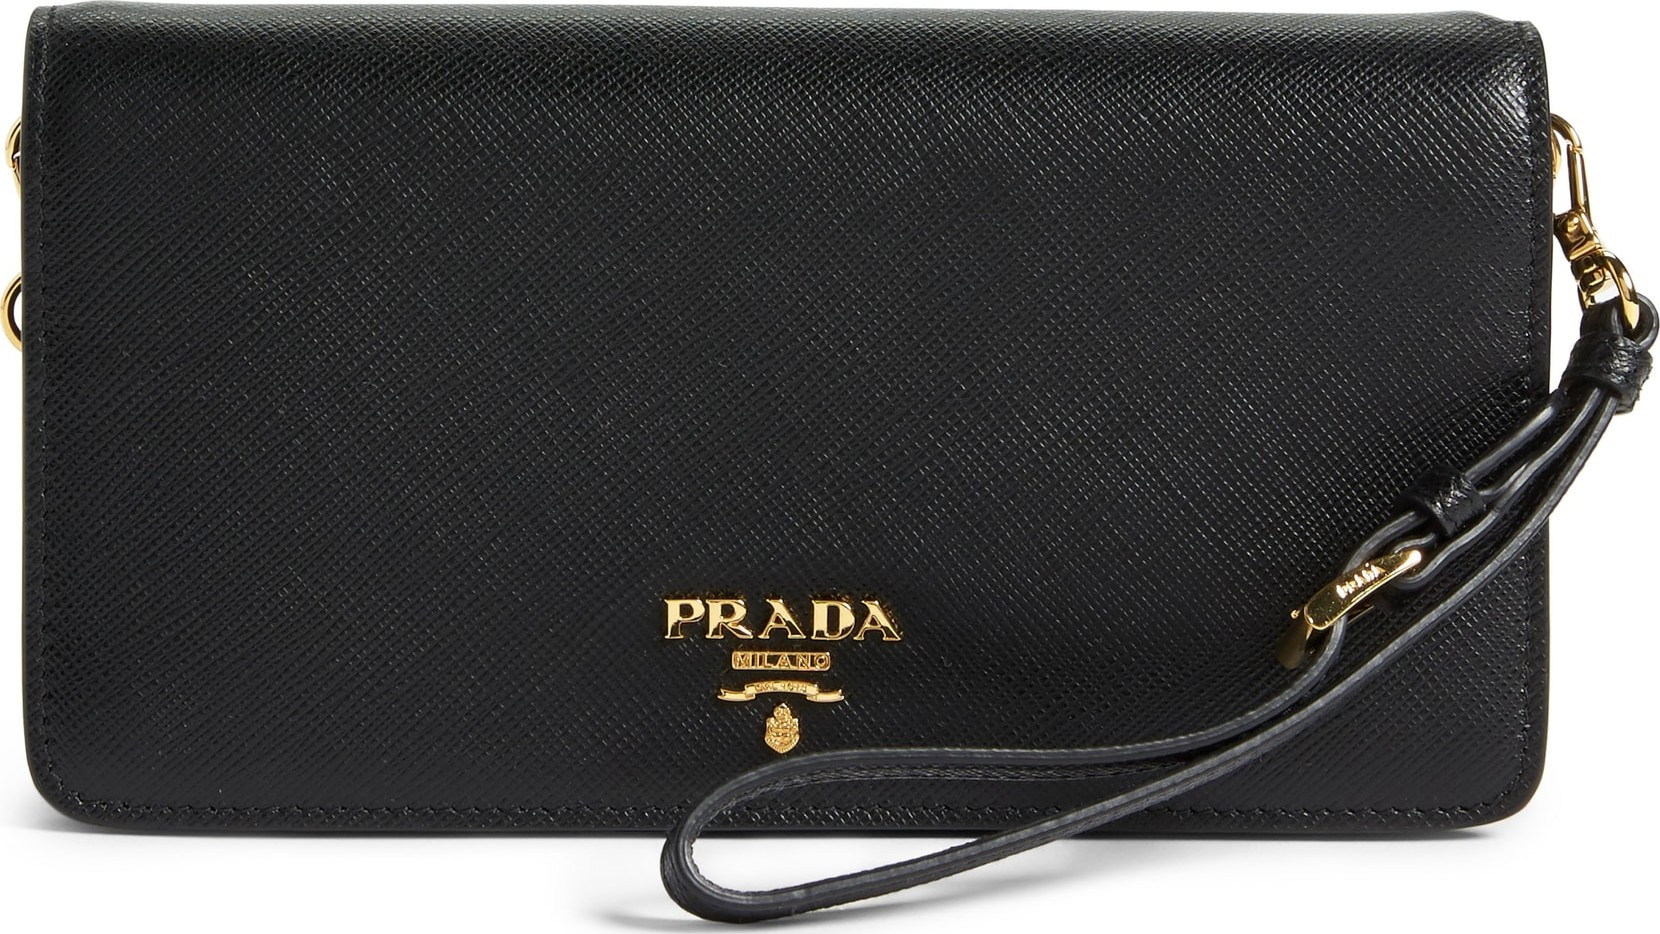 e1c07c6d385f ... uk prada saffiano metal oro flap wallet on a chain f8742 67452